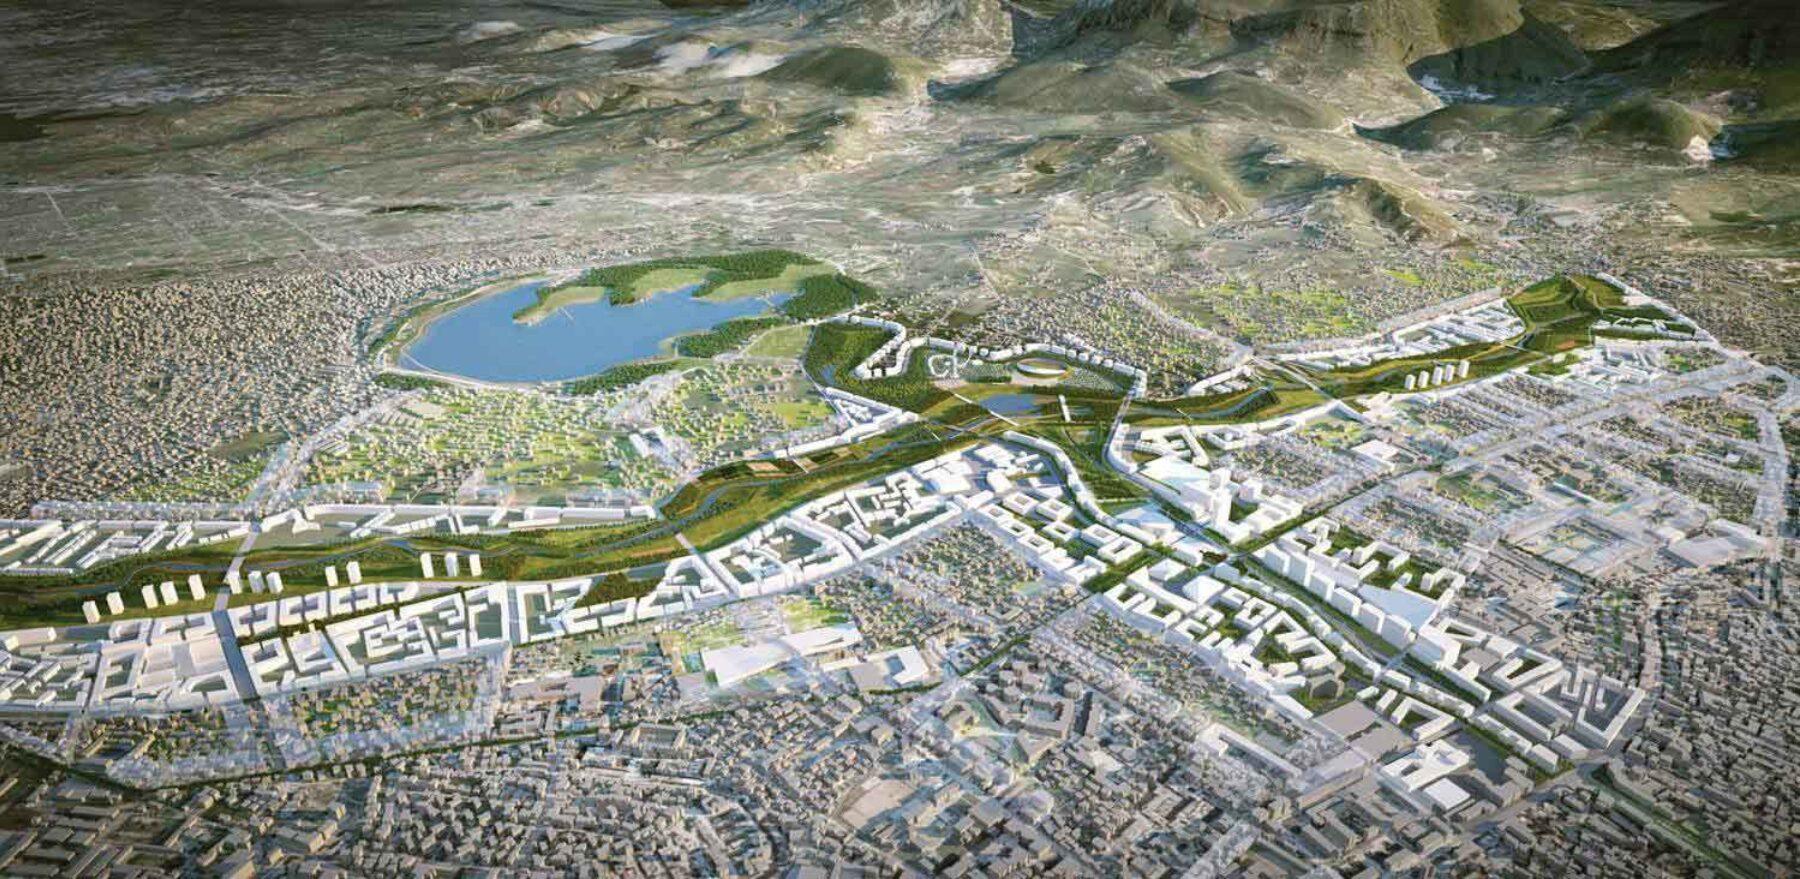 Tirana Masterplan Presented at the Polytechnic of Milan